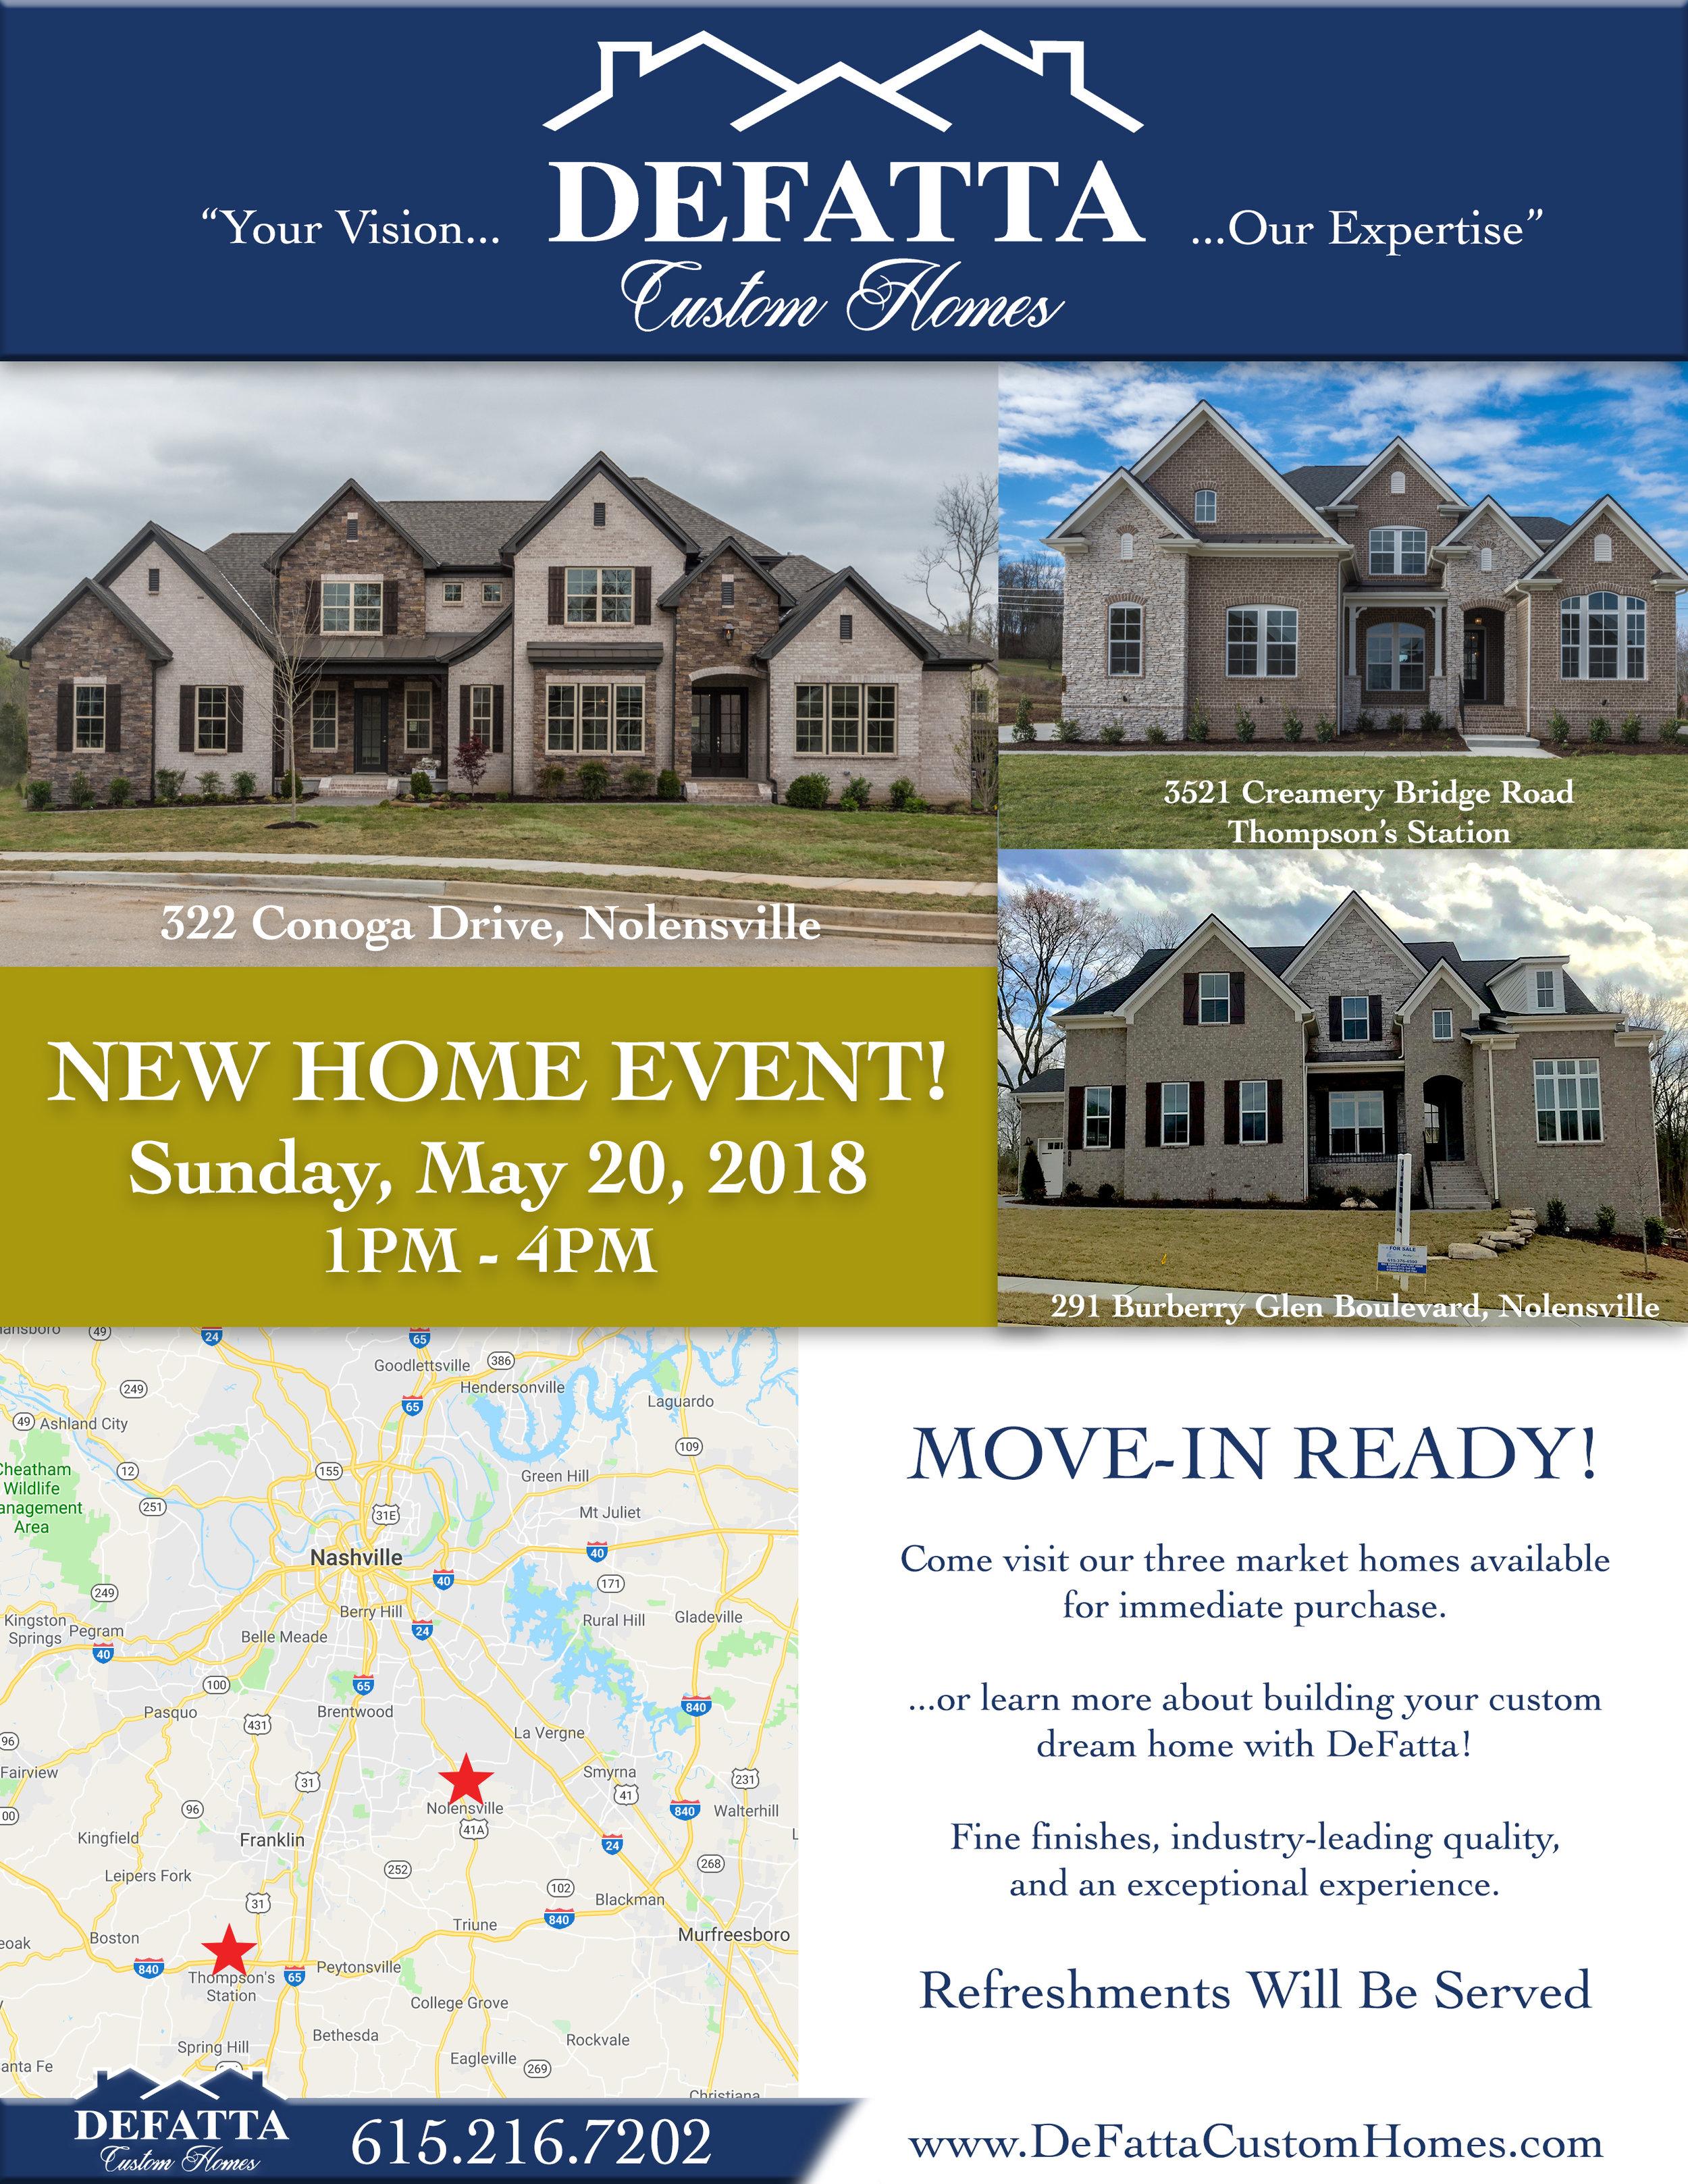 5-15-2018 New Home Event Flyer.jpg